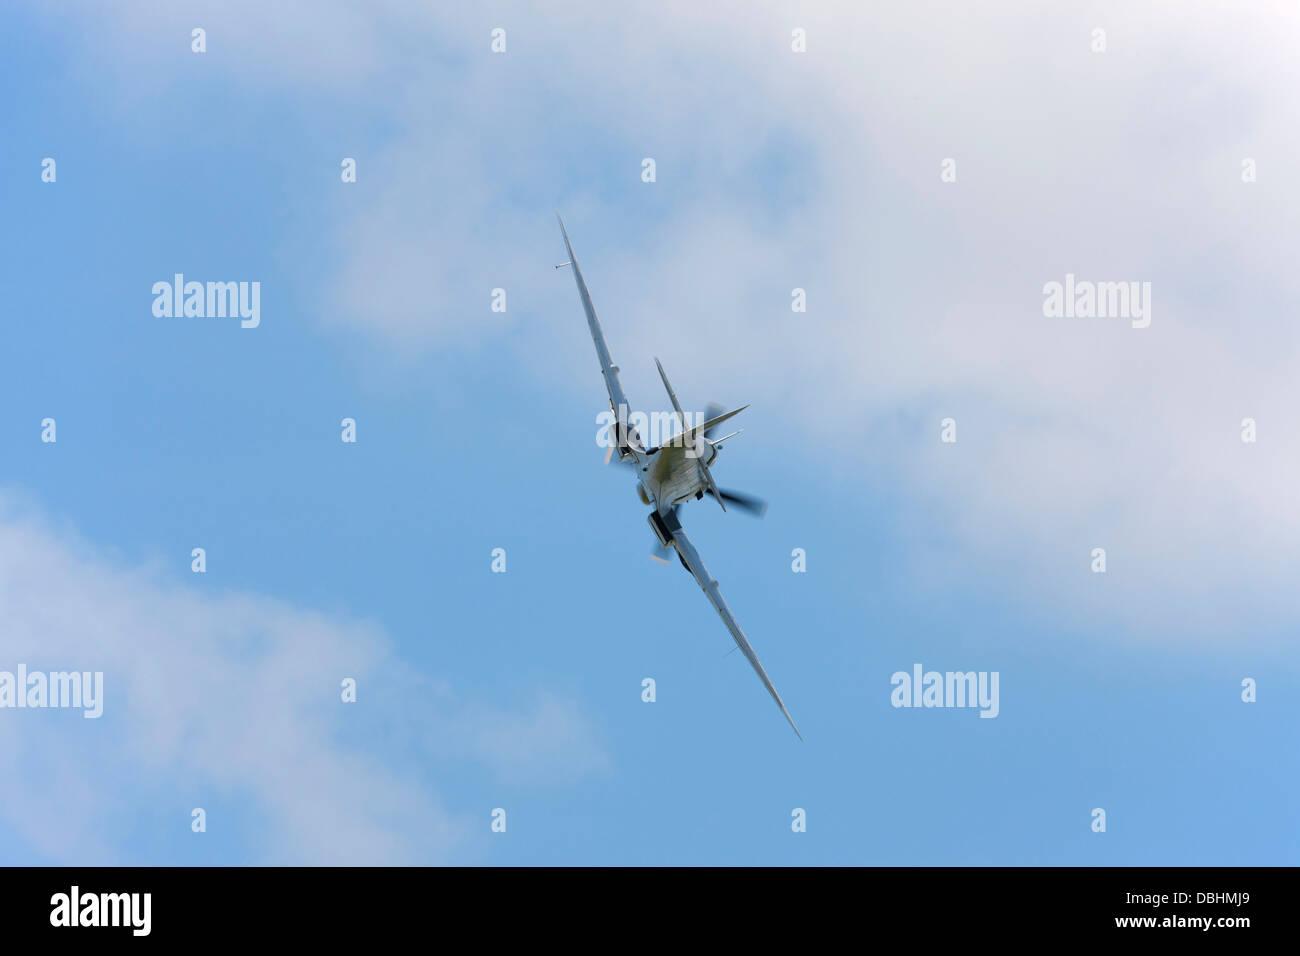 Vickers Supermarine Spitfire Mk LFIXe UF-Q MK356 in flight over Breighton Airfield - Stock Image